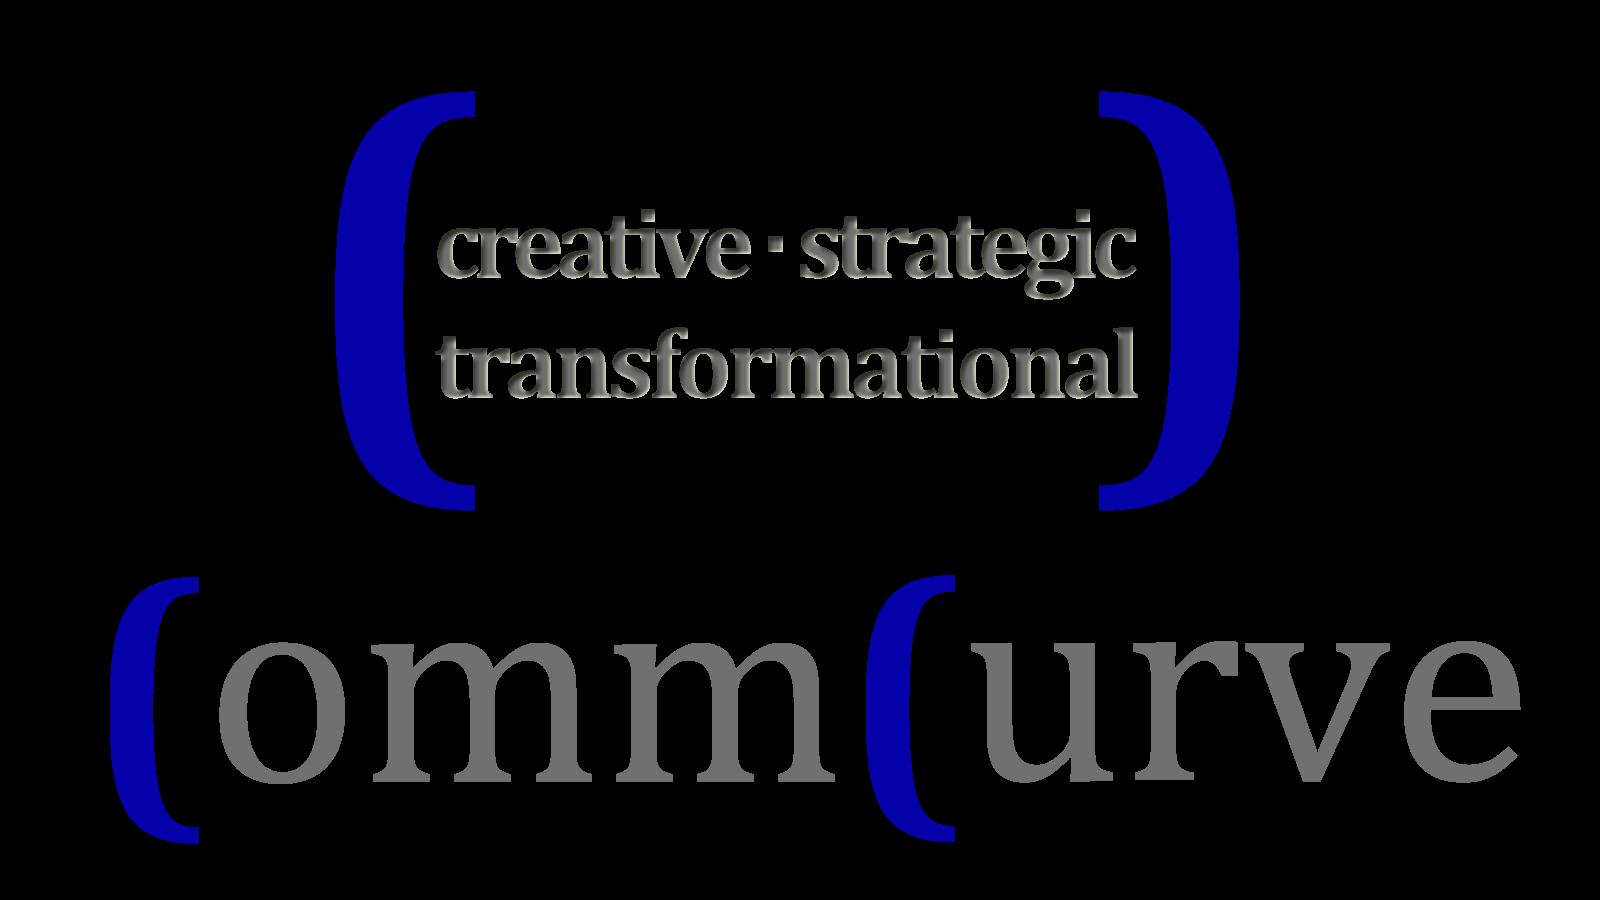 CommCurve sponsors Texas Volunteer Management Conference